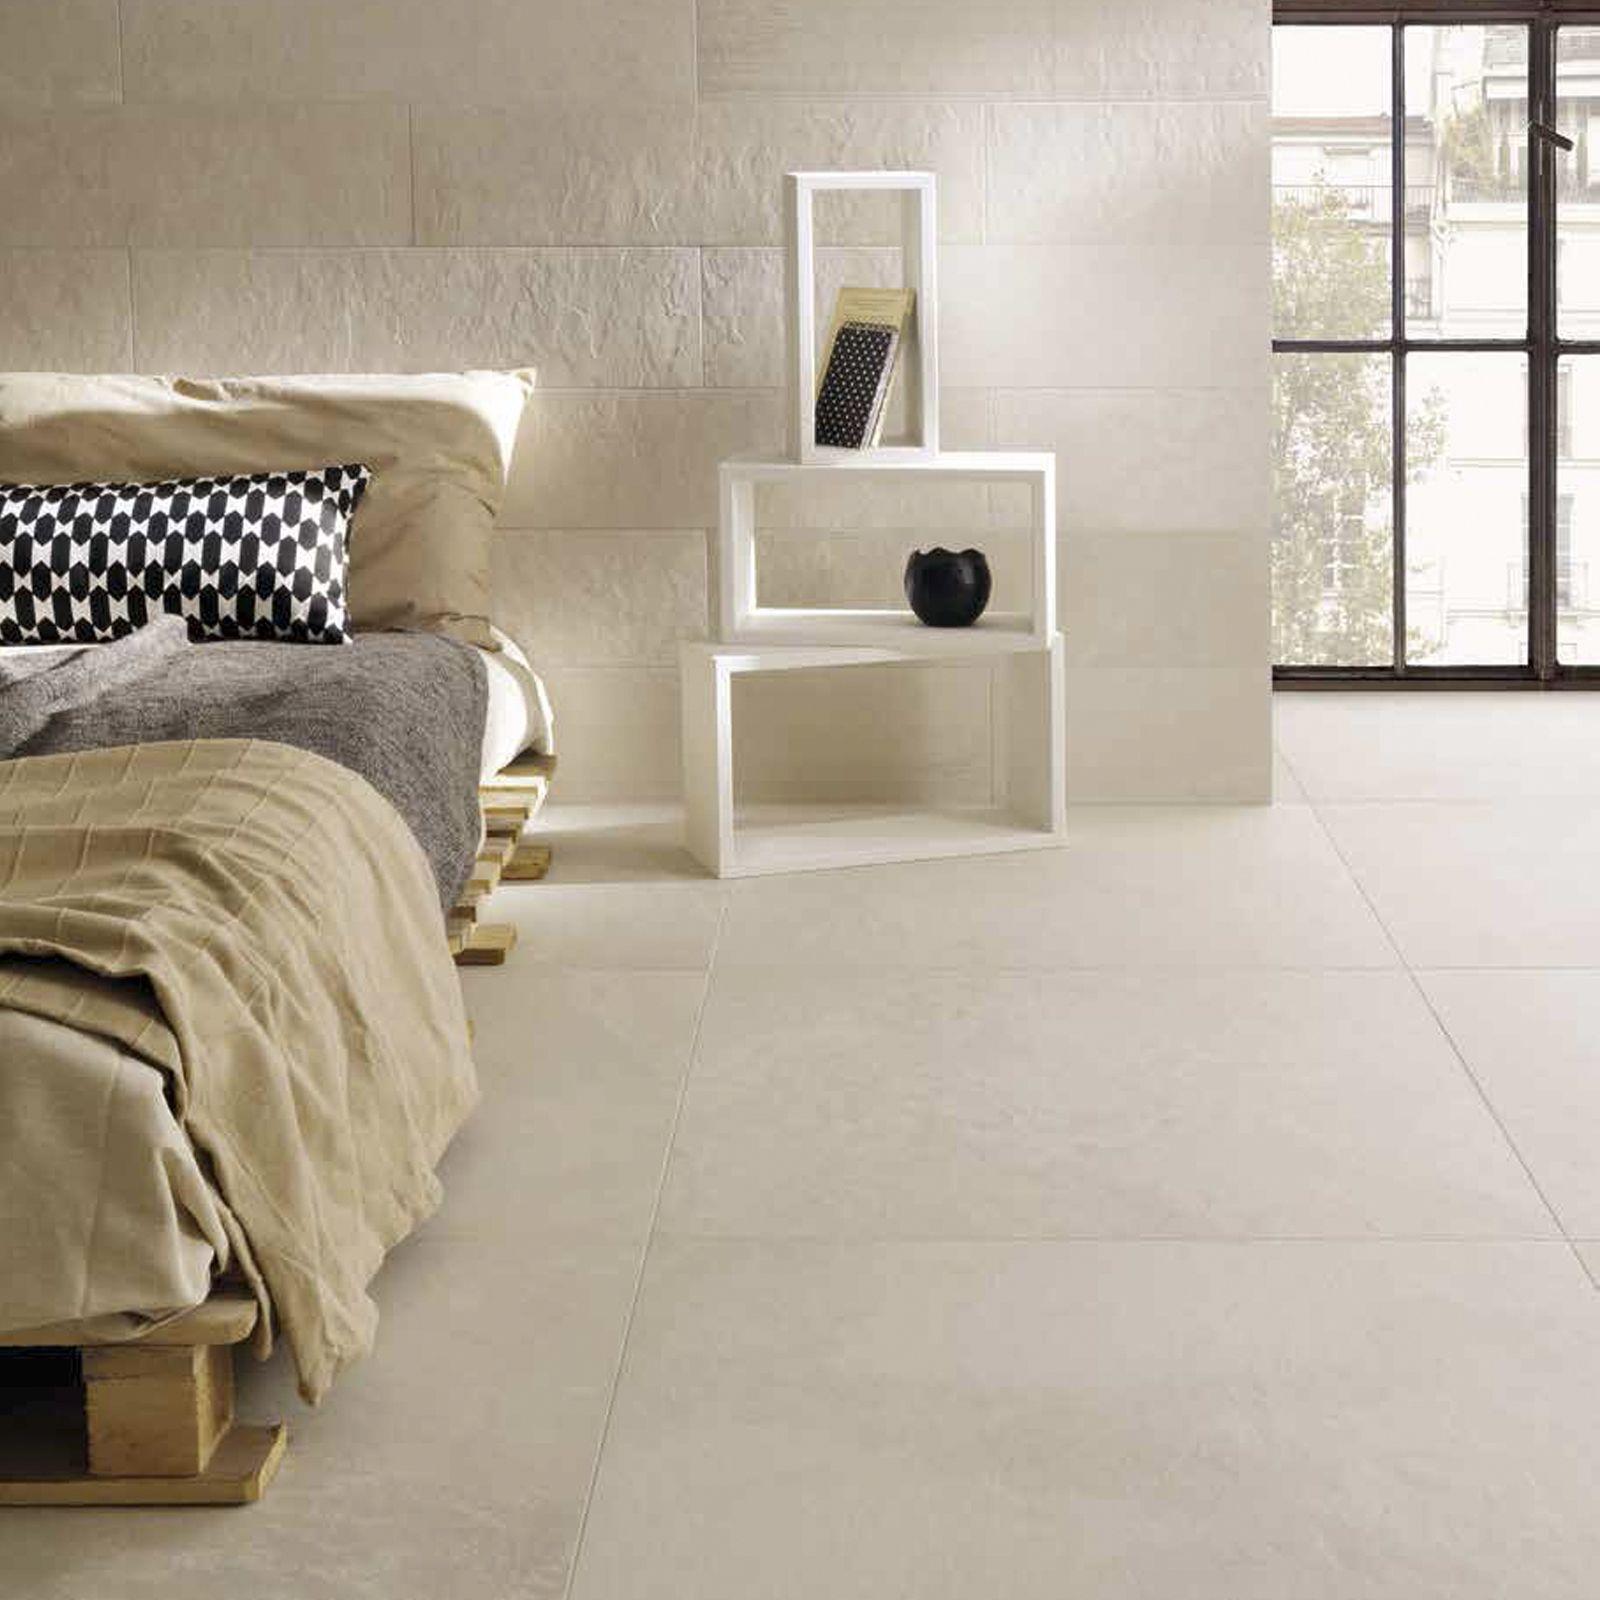 Bedroom Design With Tiles Bureau For Bedroom Boys Bedroom Color Schemes New Bedroom Bed: Modern Bedroom Design With Ardesia Mix Base Avorio Tile